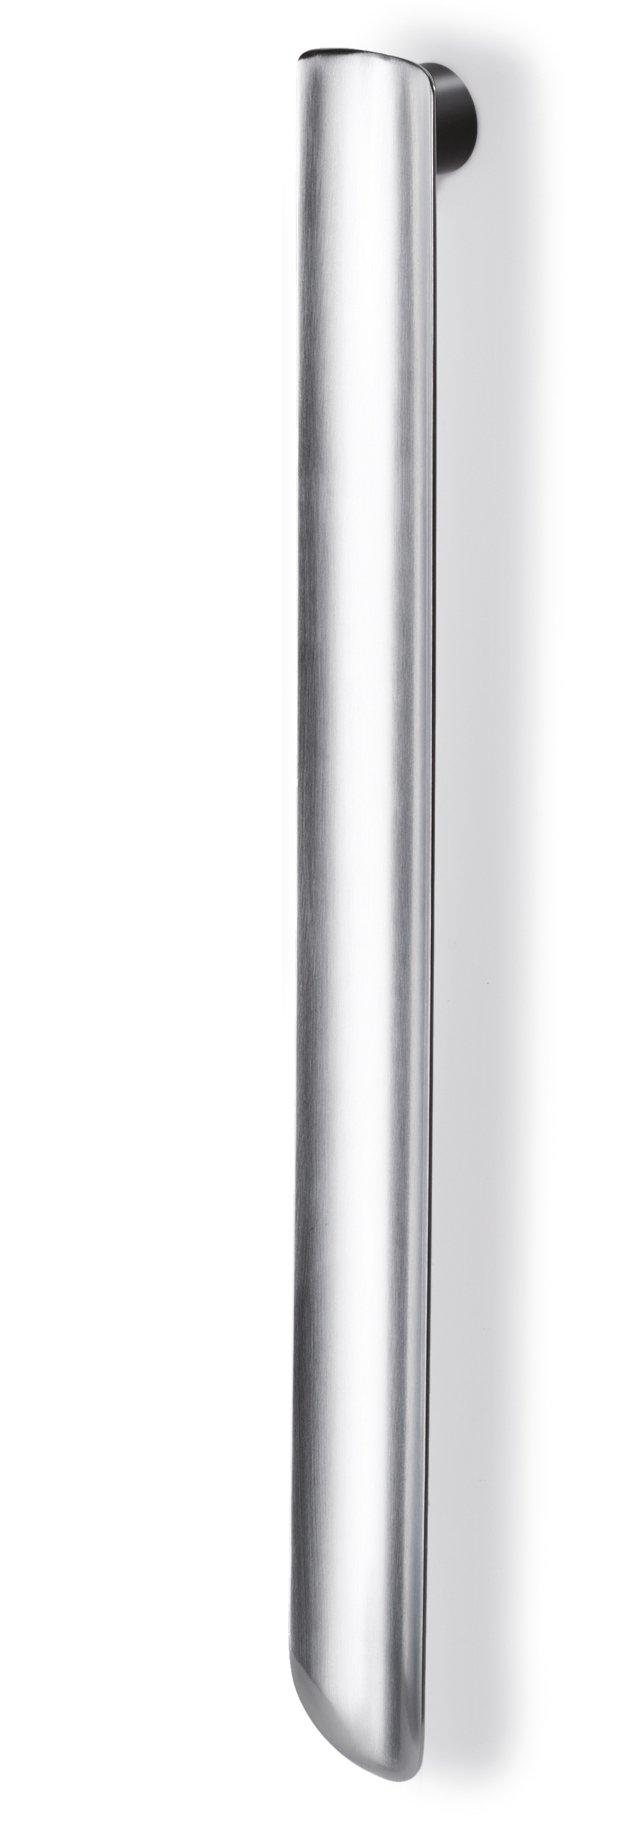 Blomus Shoe Horn L 36 cm